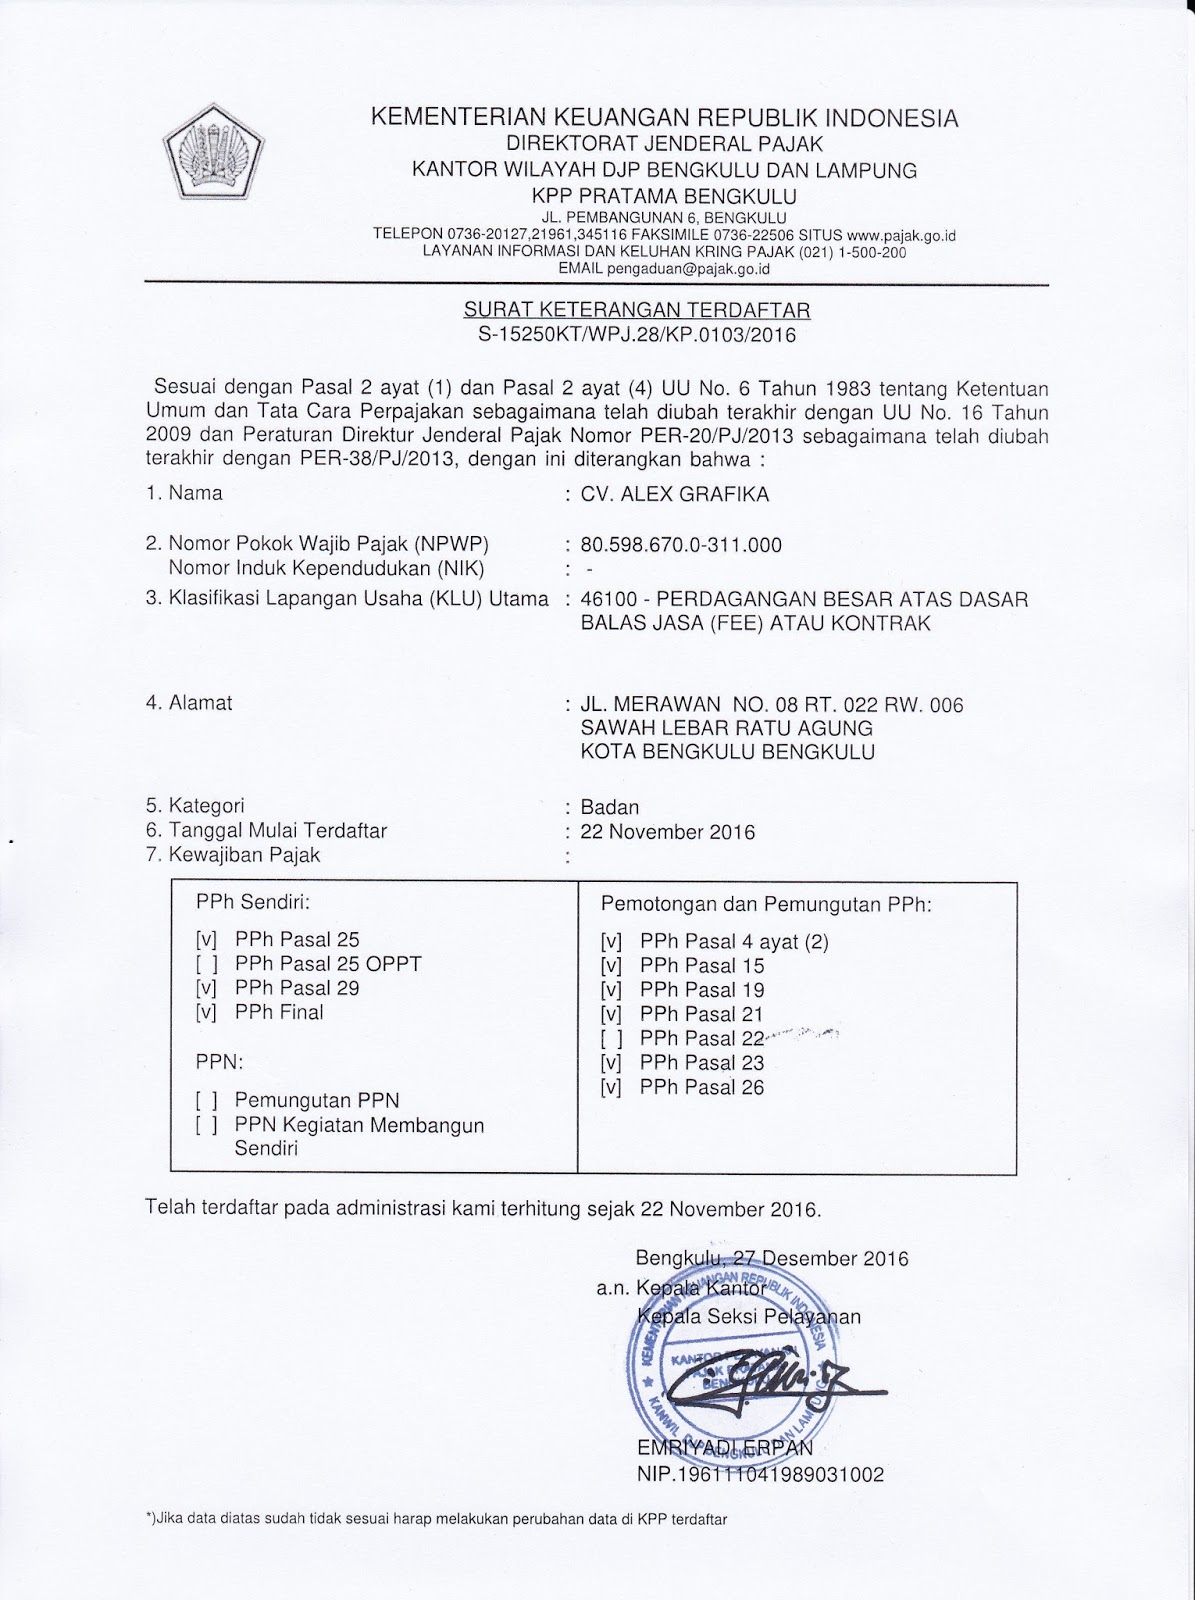 Surat Keterangan Terdaftar Wajib Pajak